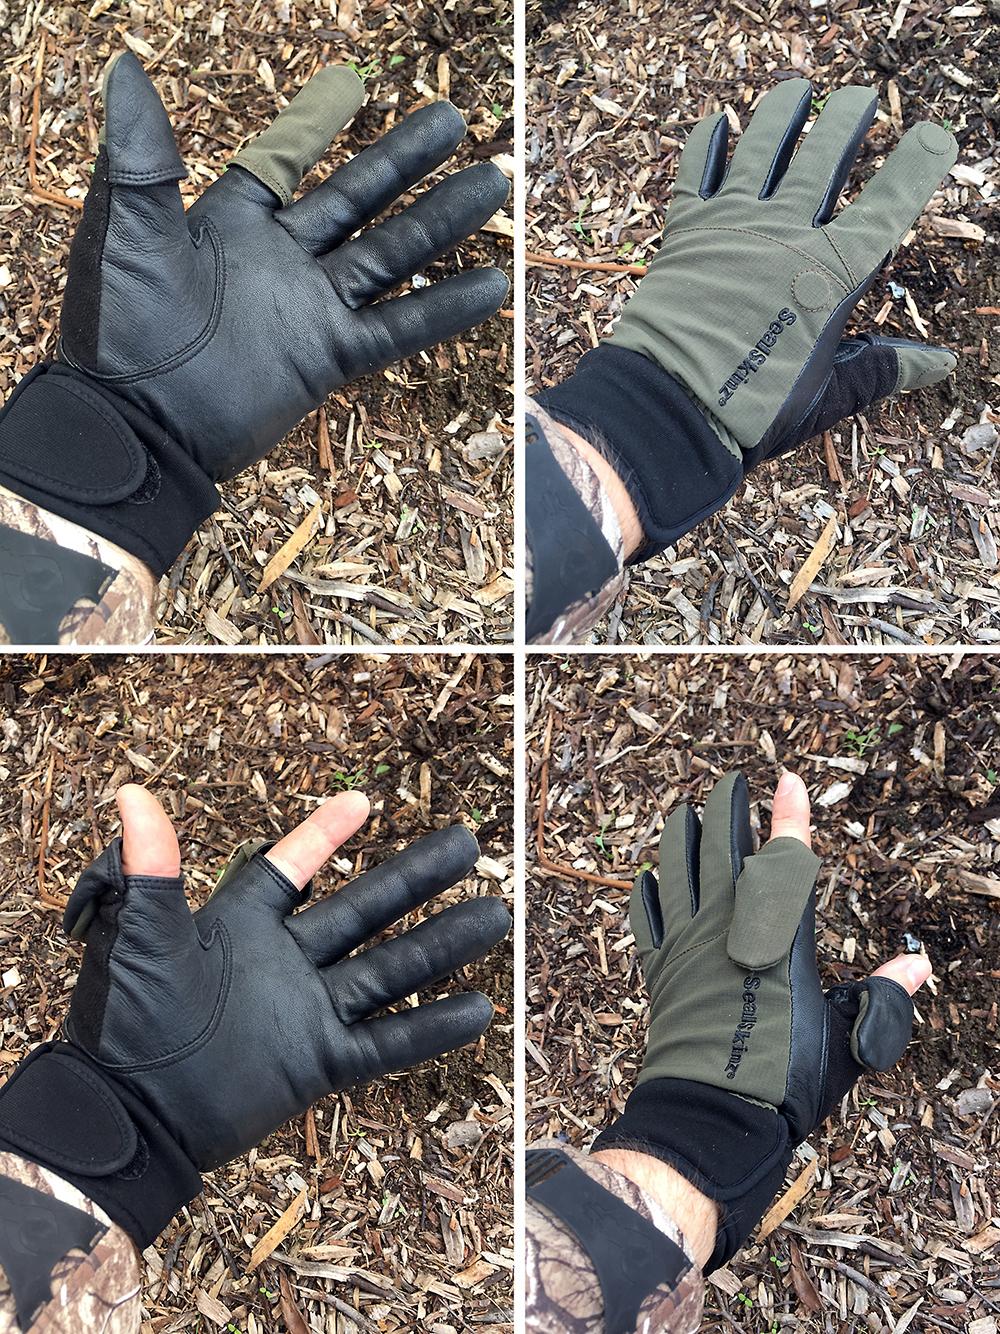 shooting glove